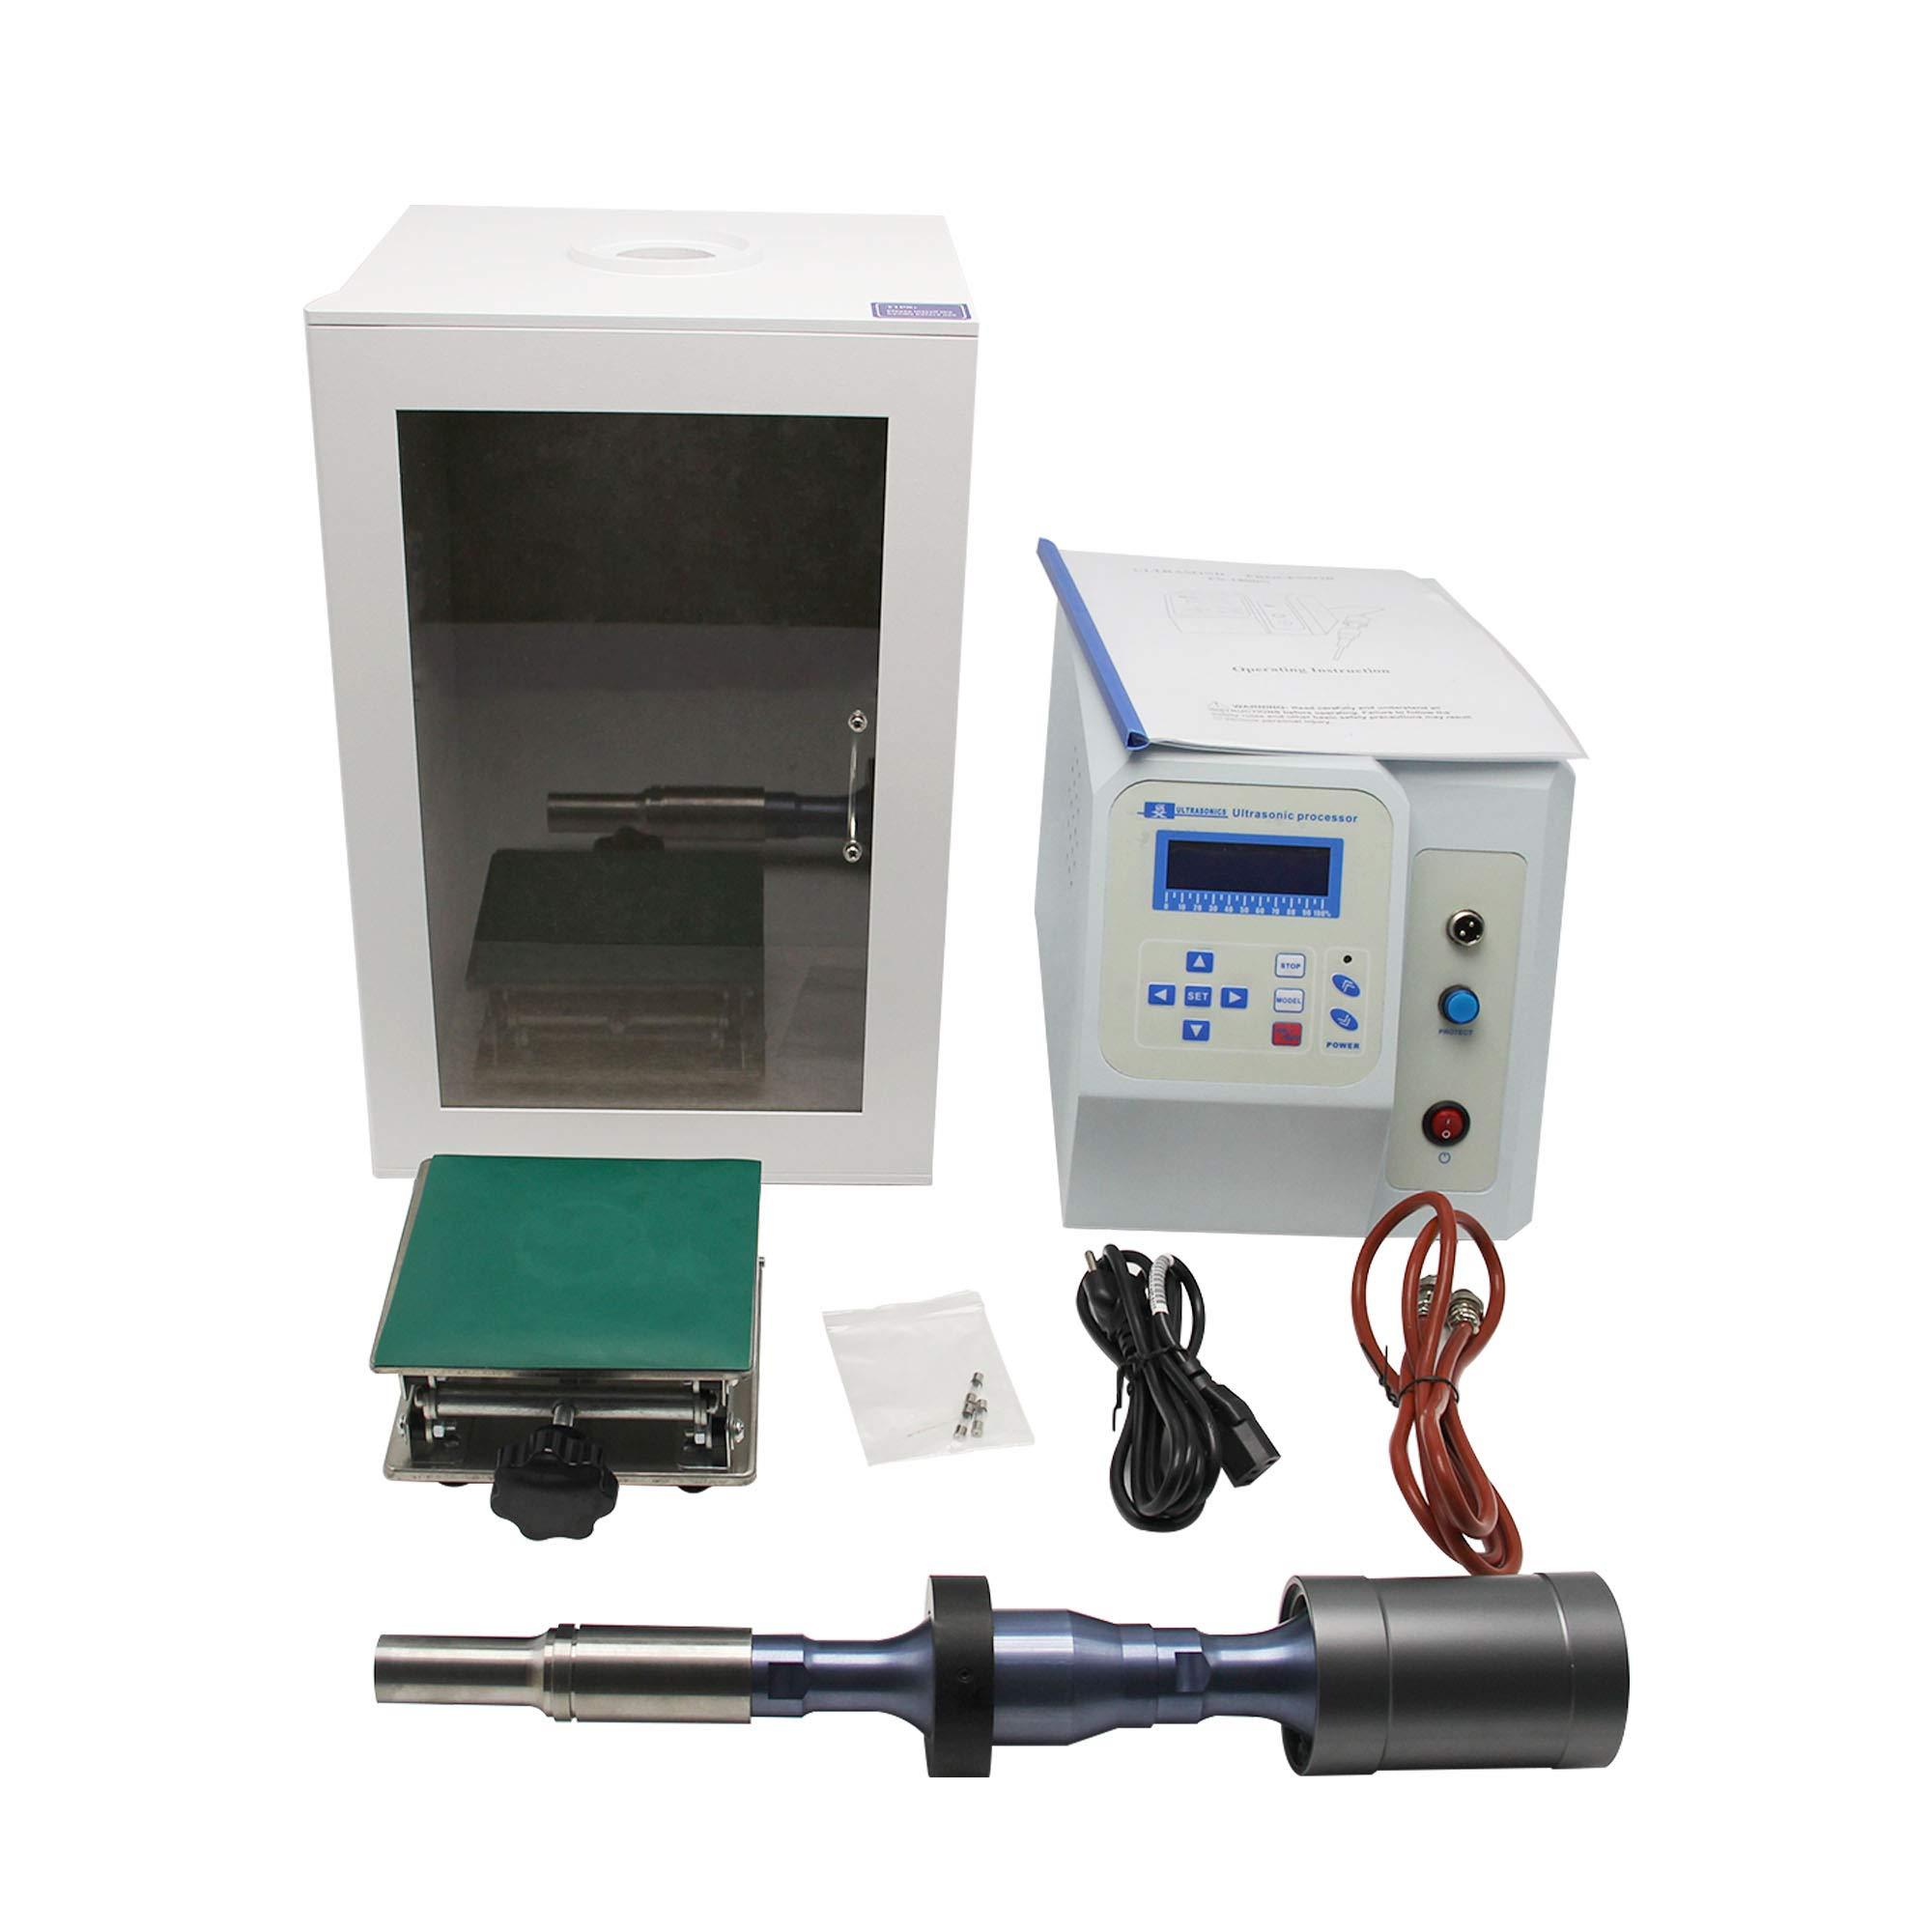 Ultrasonic Homogenizer 1800W Lab Sonicator Processor Ultrasonic Cell Disruptor Handling Capacity 100ml—3000ml by BAOSHISHAN (Image #7)